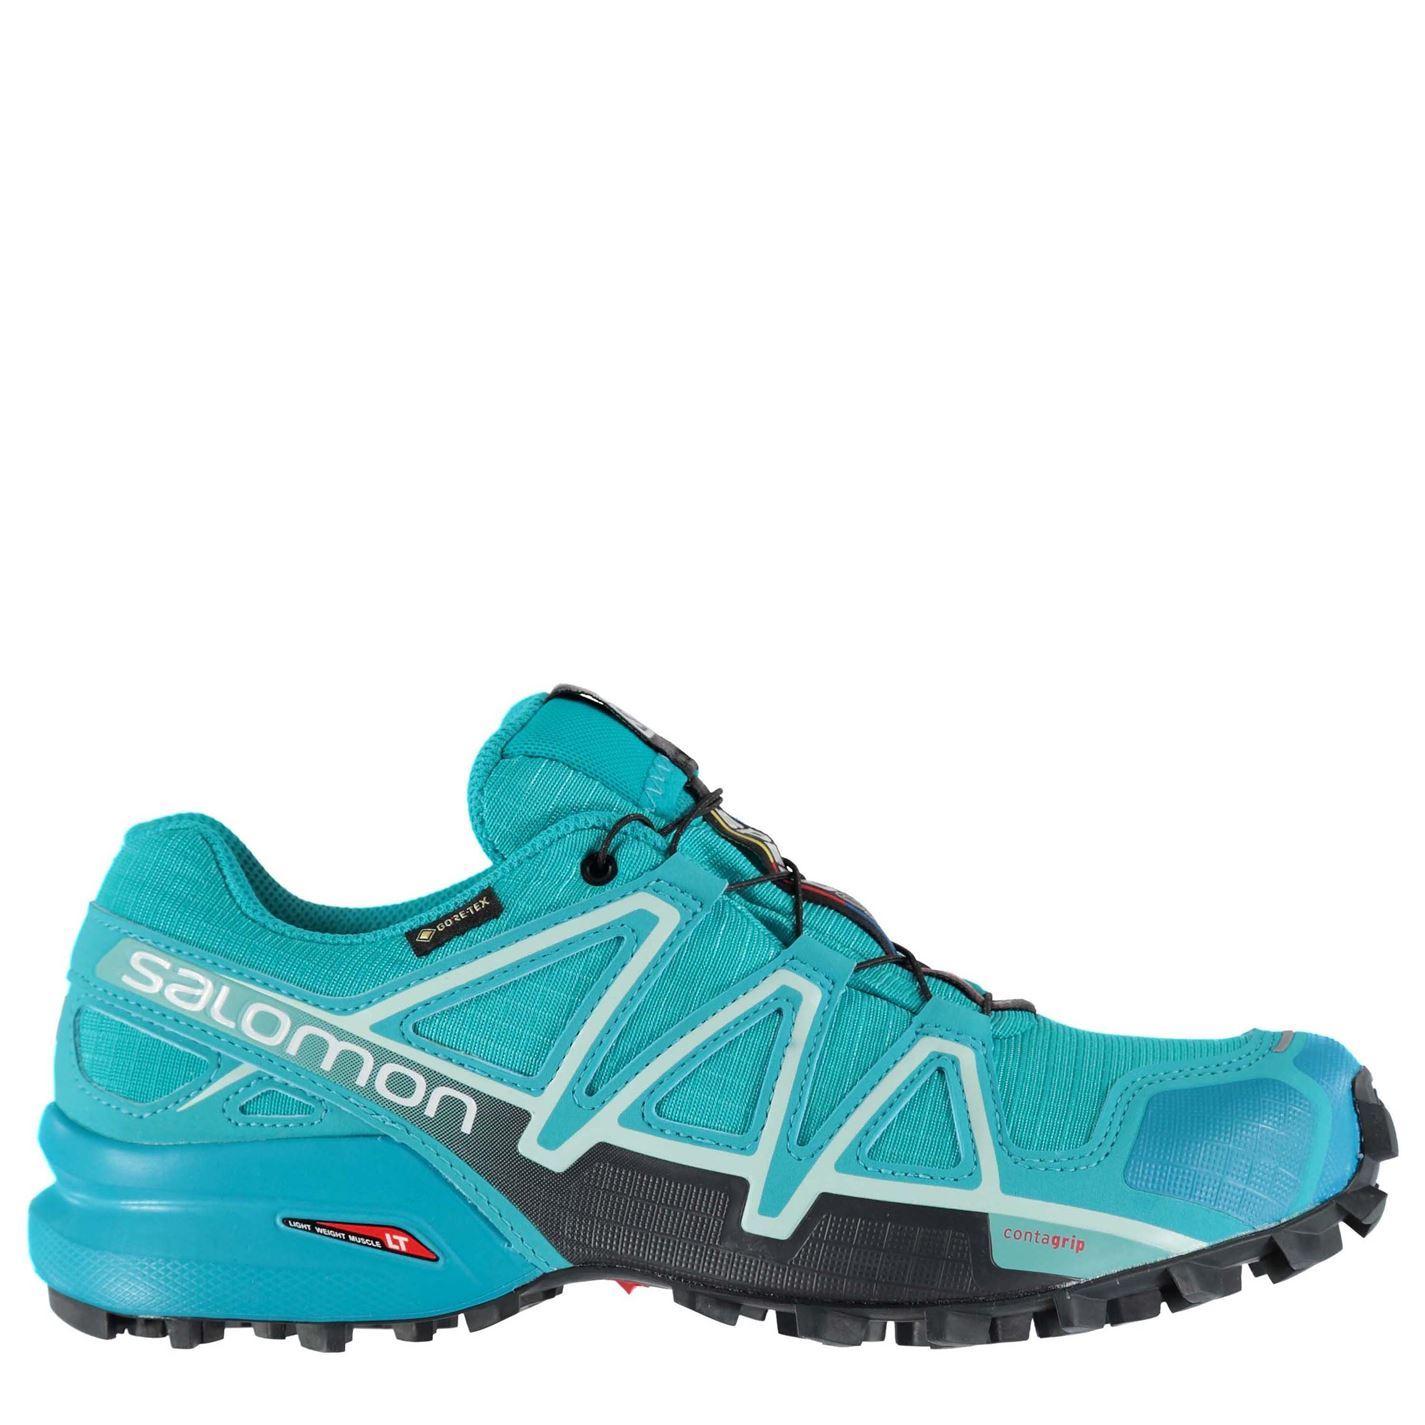 salomon speedcross 4 gtx women's trail running shoes zapatillas